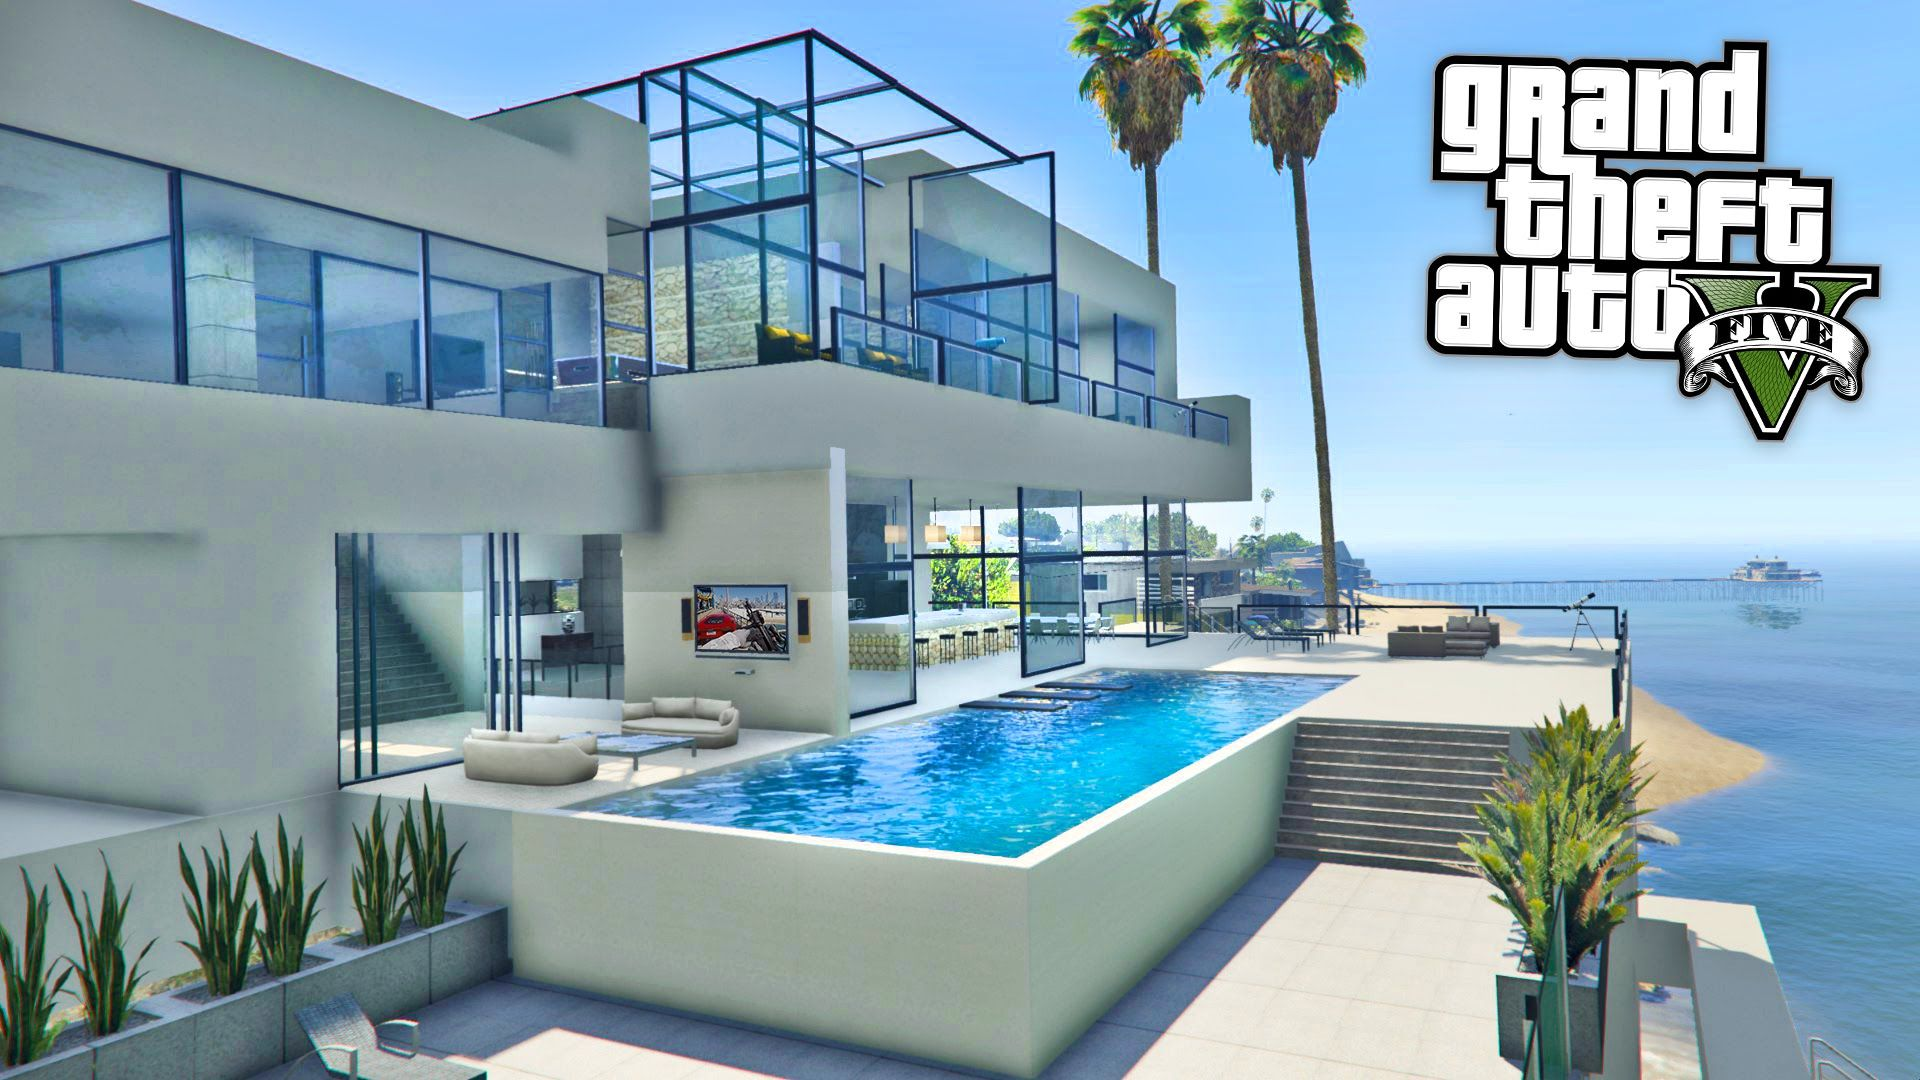 Gta 5 Mods Billionaires Mansions Mod Tour Gta 5 Mansions Mod Gamepla Arquitetura